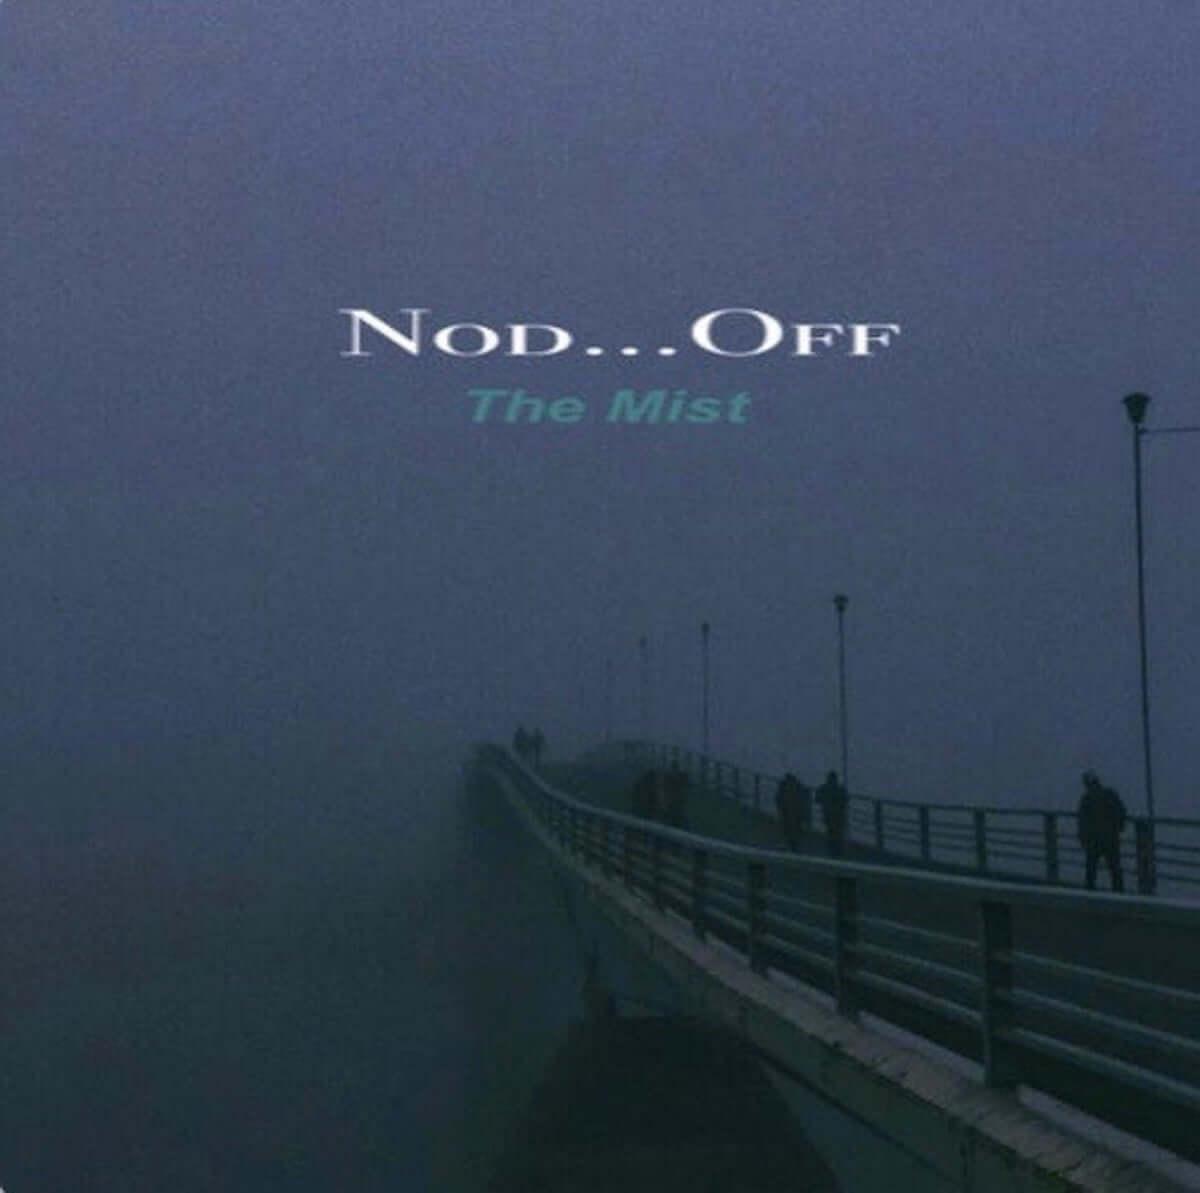 Ano(t)raksのDai OgasawaraによるインターネットのIndie Pop 最新7選 anotracks190121-indie-pop-4-1200x1193